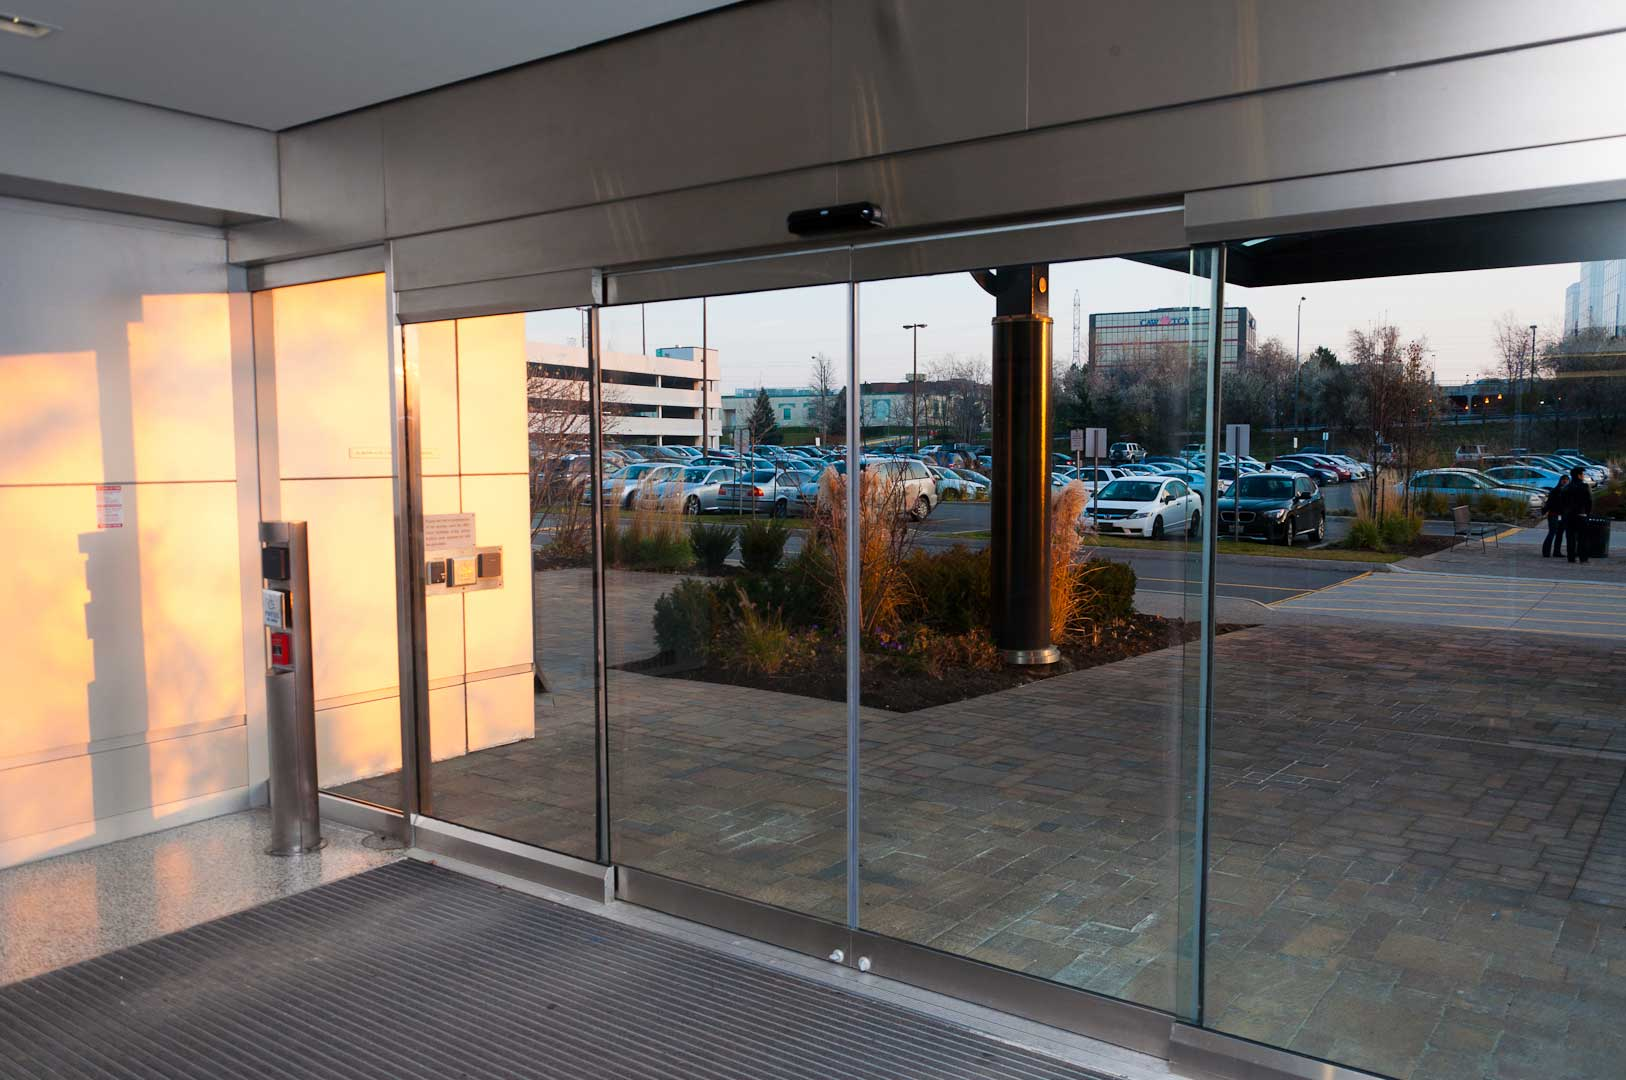 Exterior Glass doors in a tormax 9500 sliding door system installed by explore1.ca